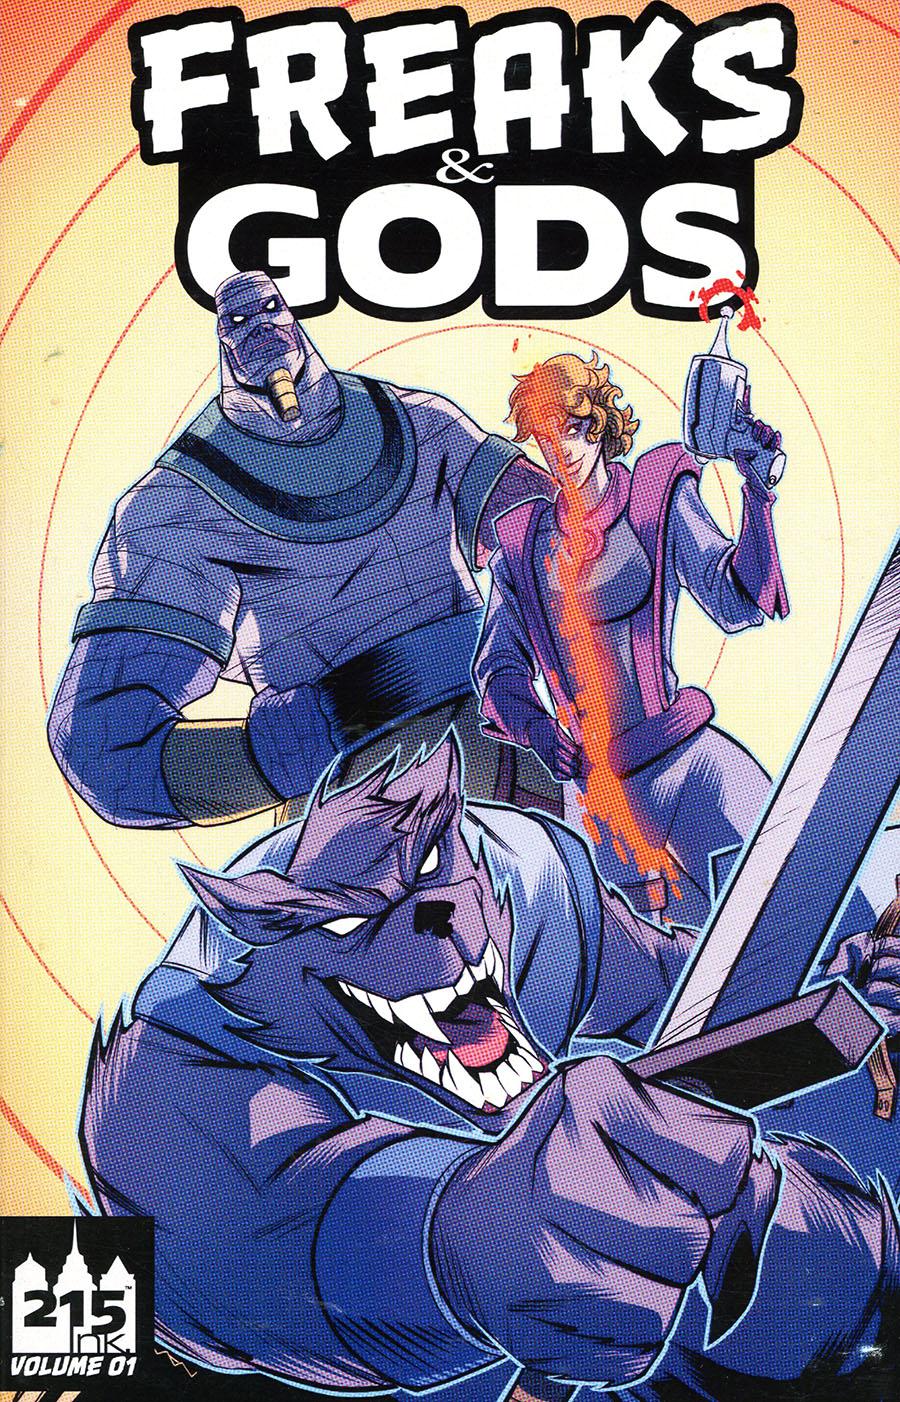 Freaks & Gods Vol 1 TP